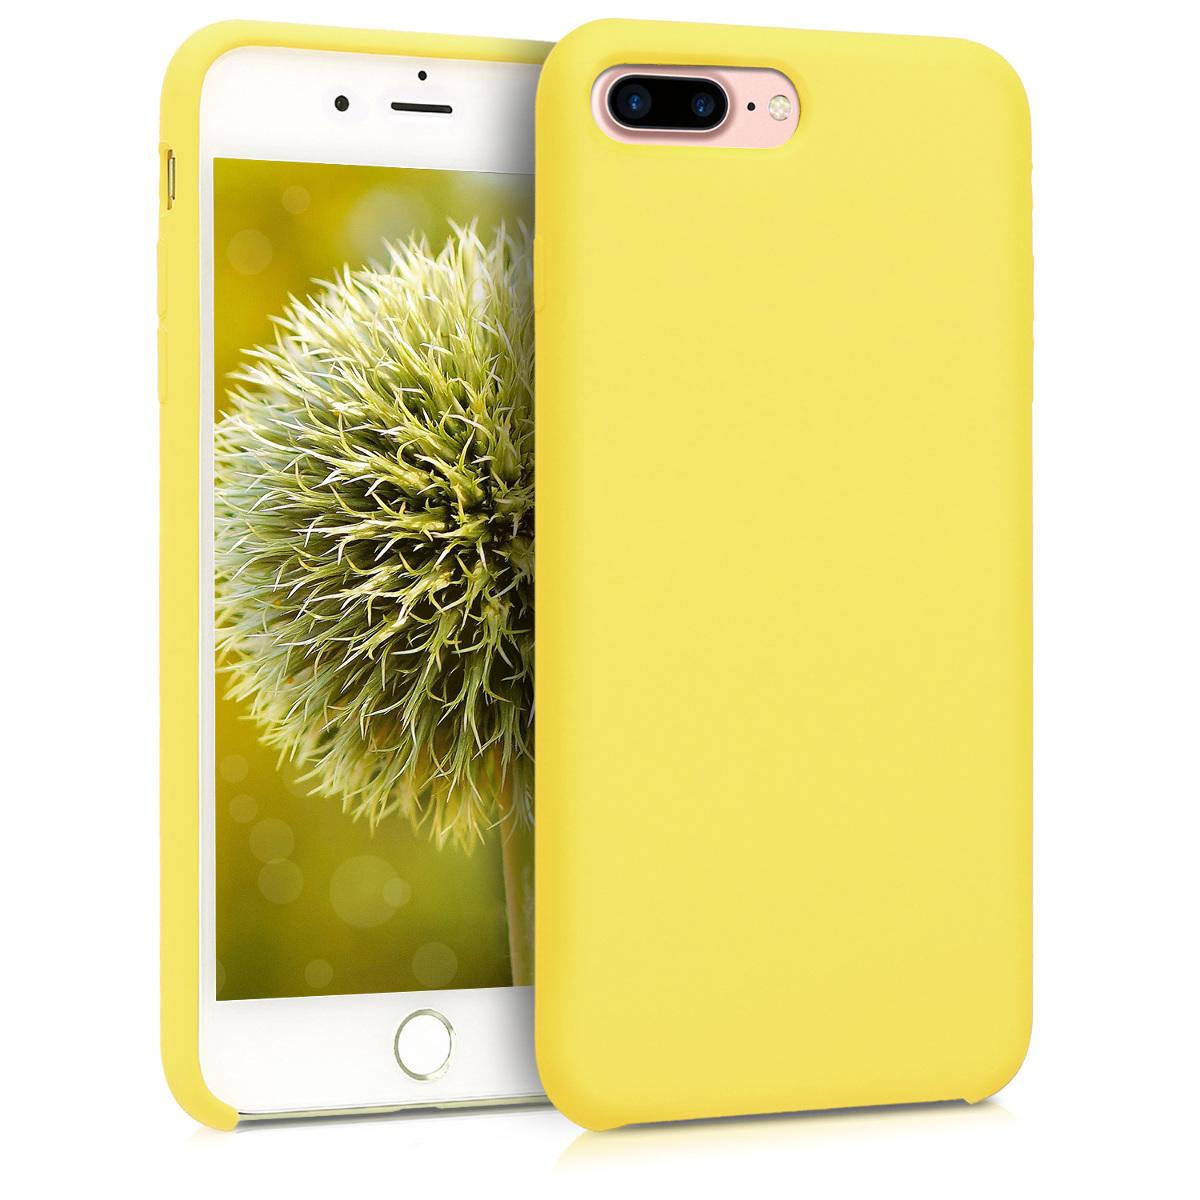 KW TPU Θήκης Σιλικόνης Apple iPhone 7 Plus / 8 Plus - Soft Flexible Rubber - Pastel Yellow (40842.30)